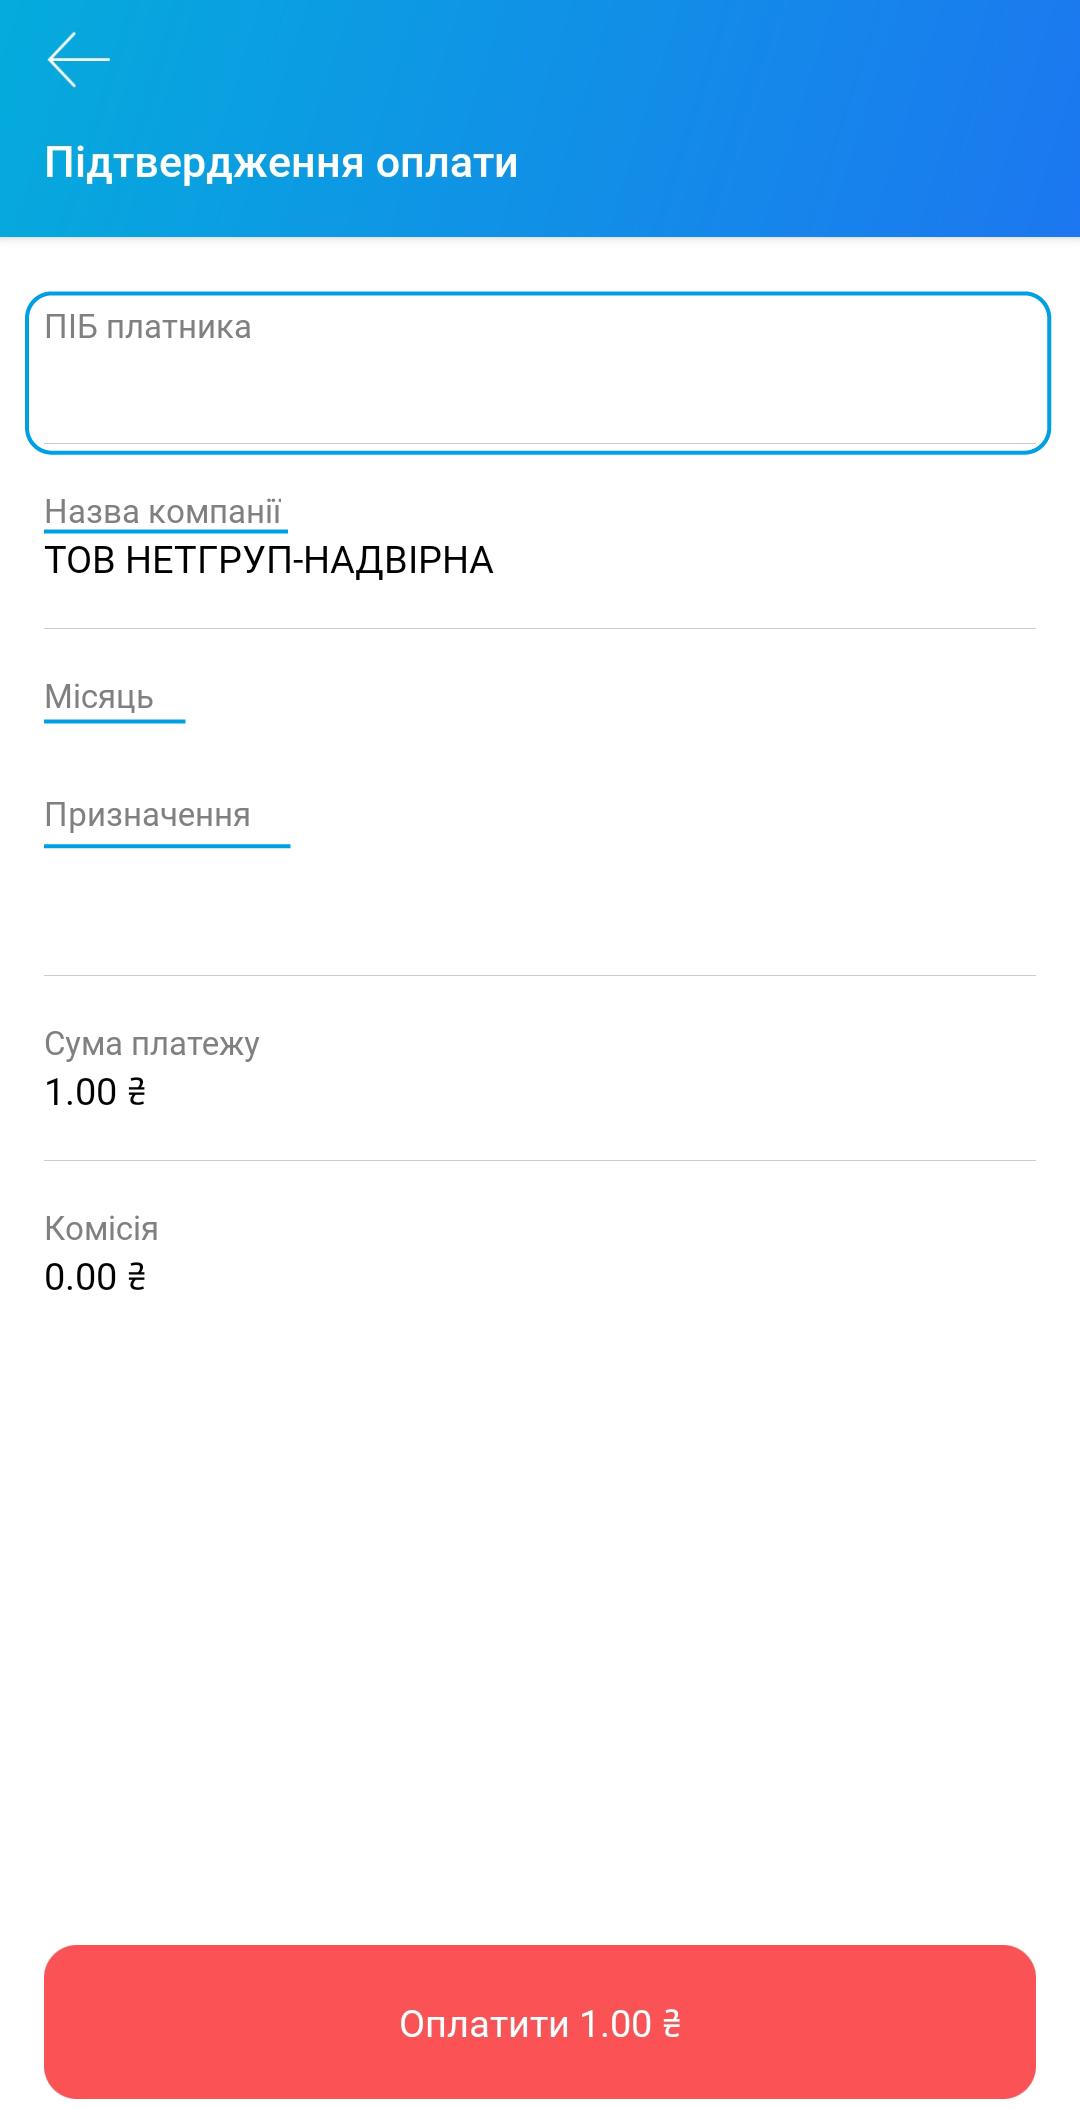 оплата онлайн   monobank   netgroup